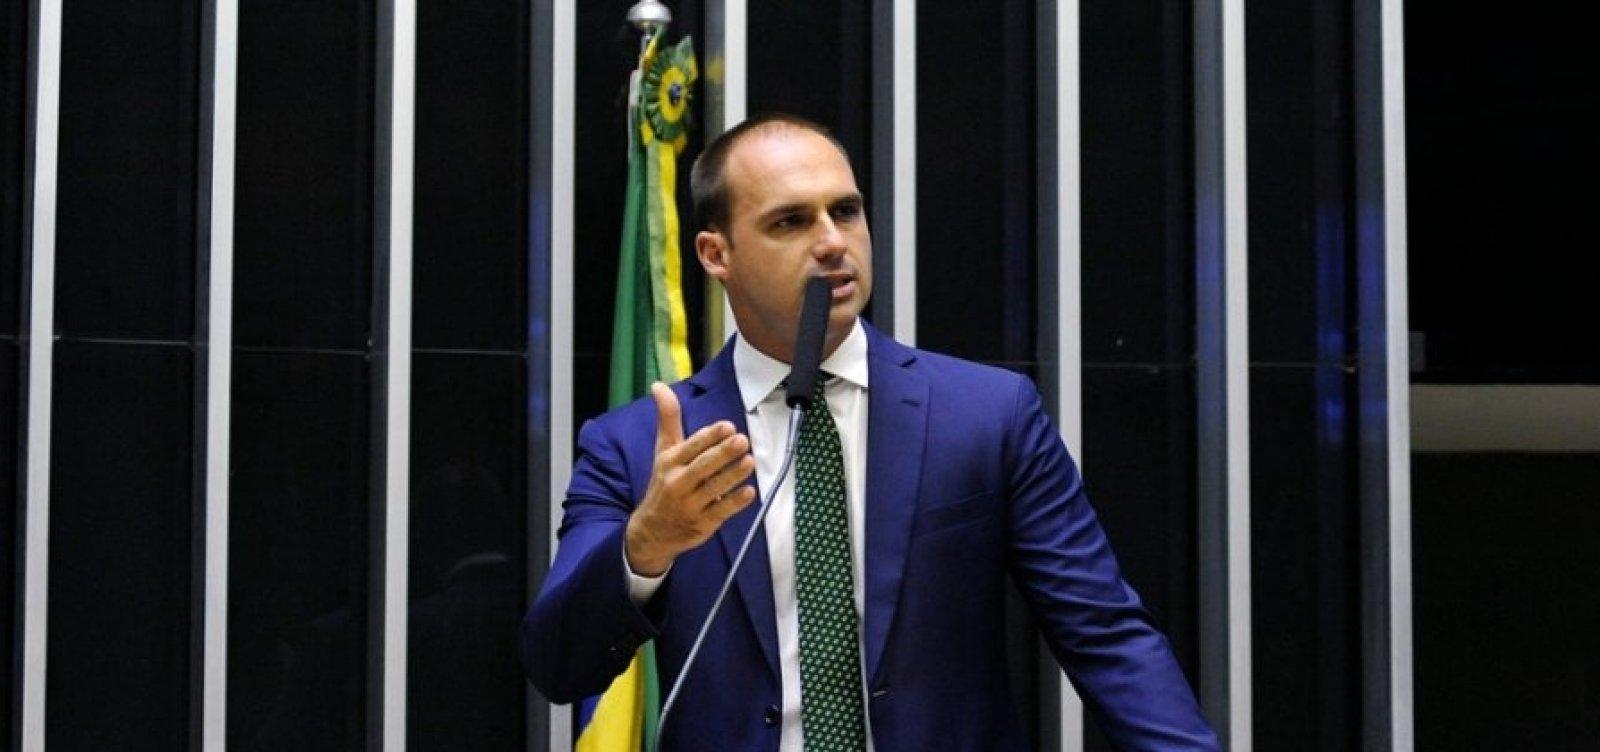 [Supremo tenta intimar filho de Bolsonaro, mas não consegue localizá-lo]